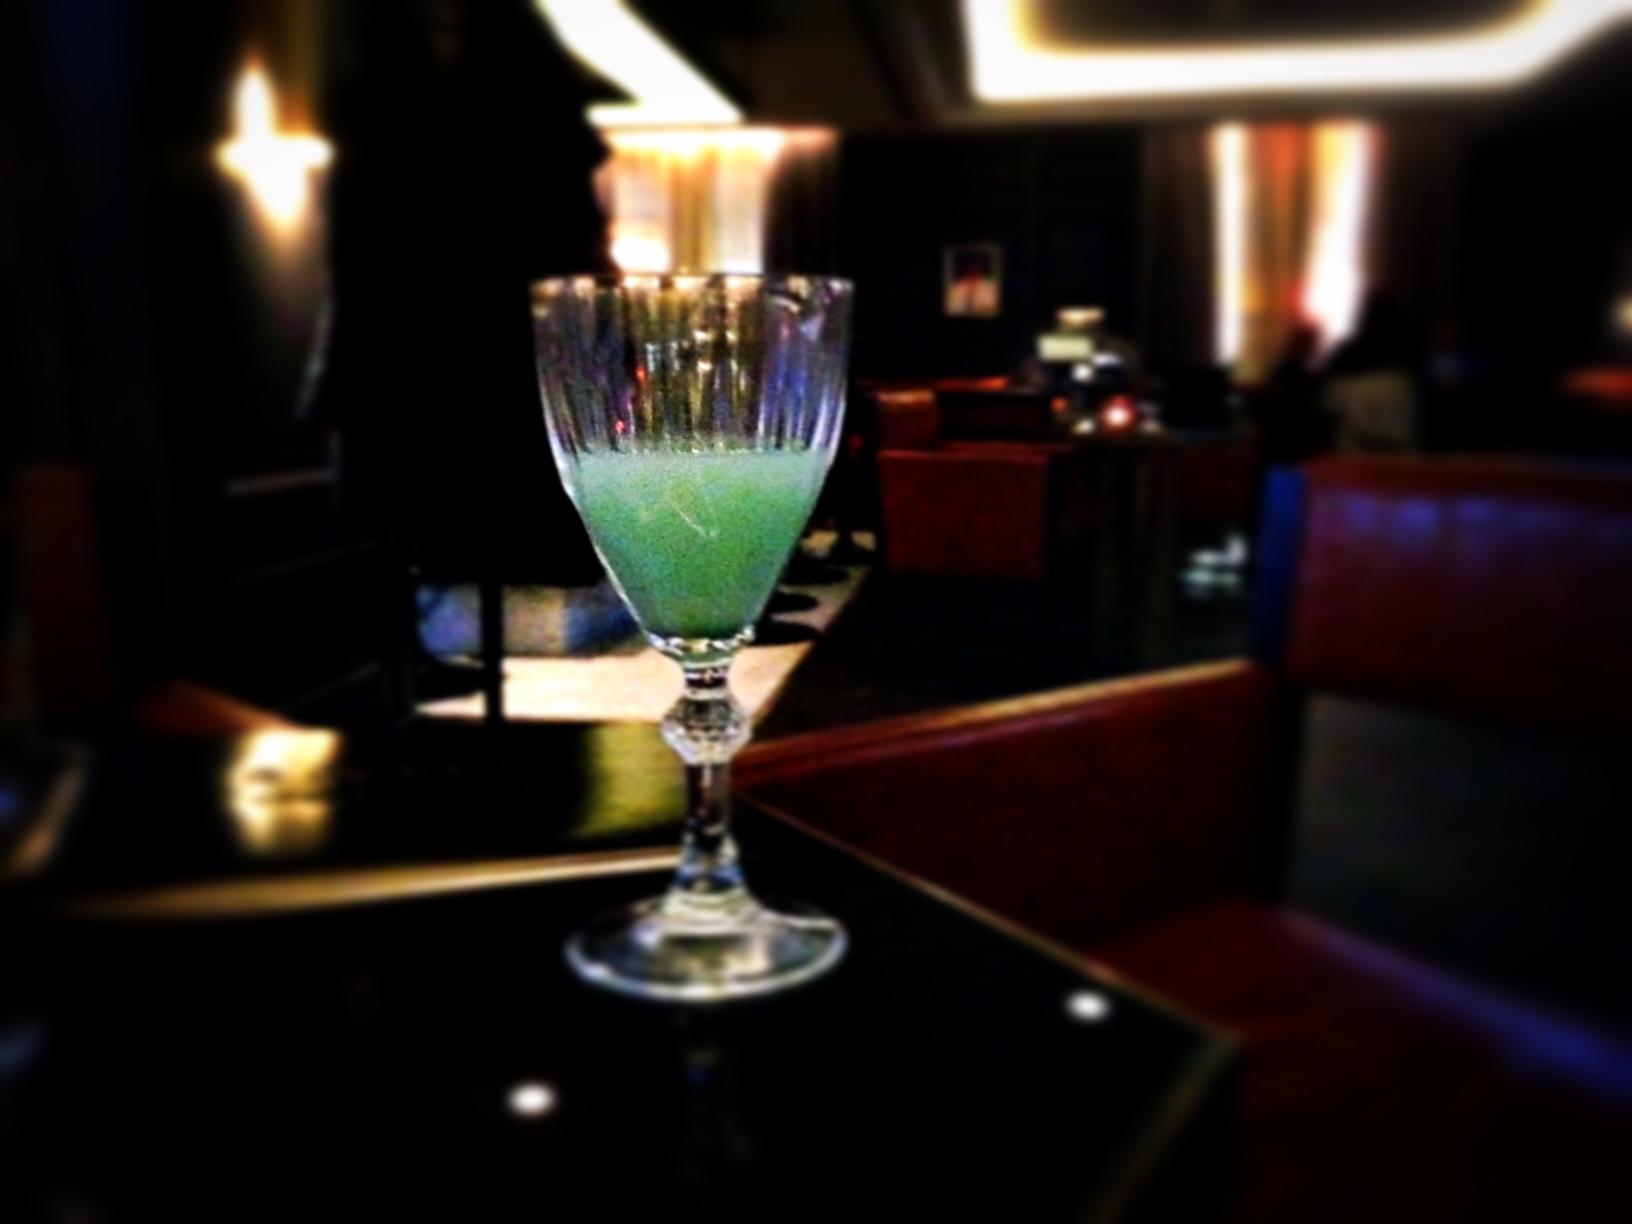 Hilton Plaza, Emile Bar & Brasserie - kekinwien.at